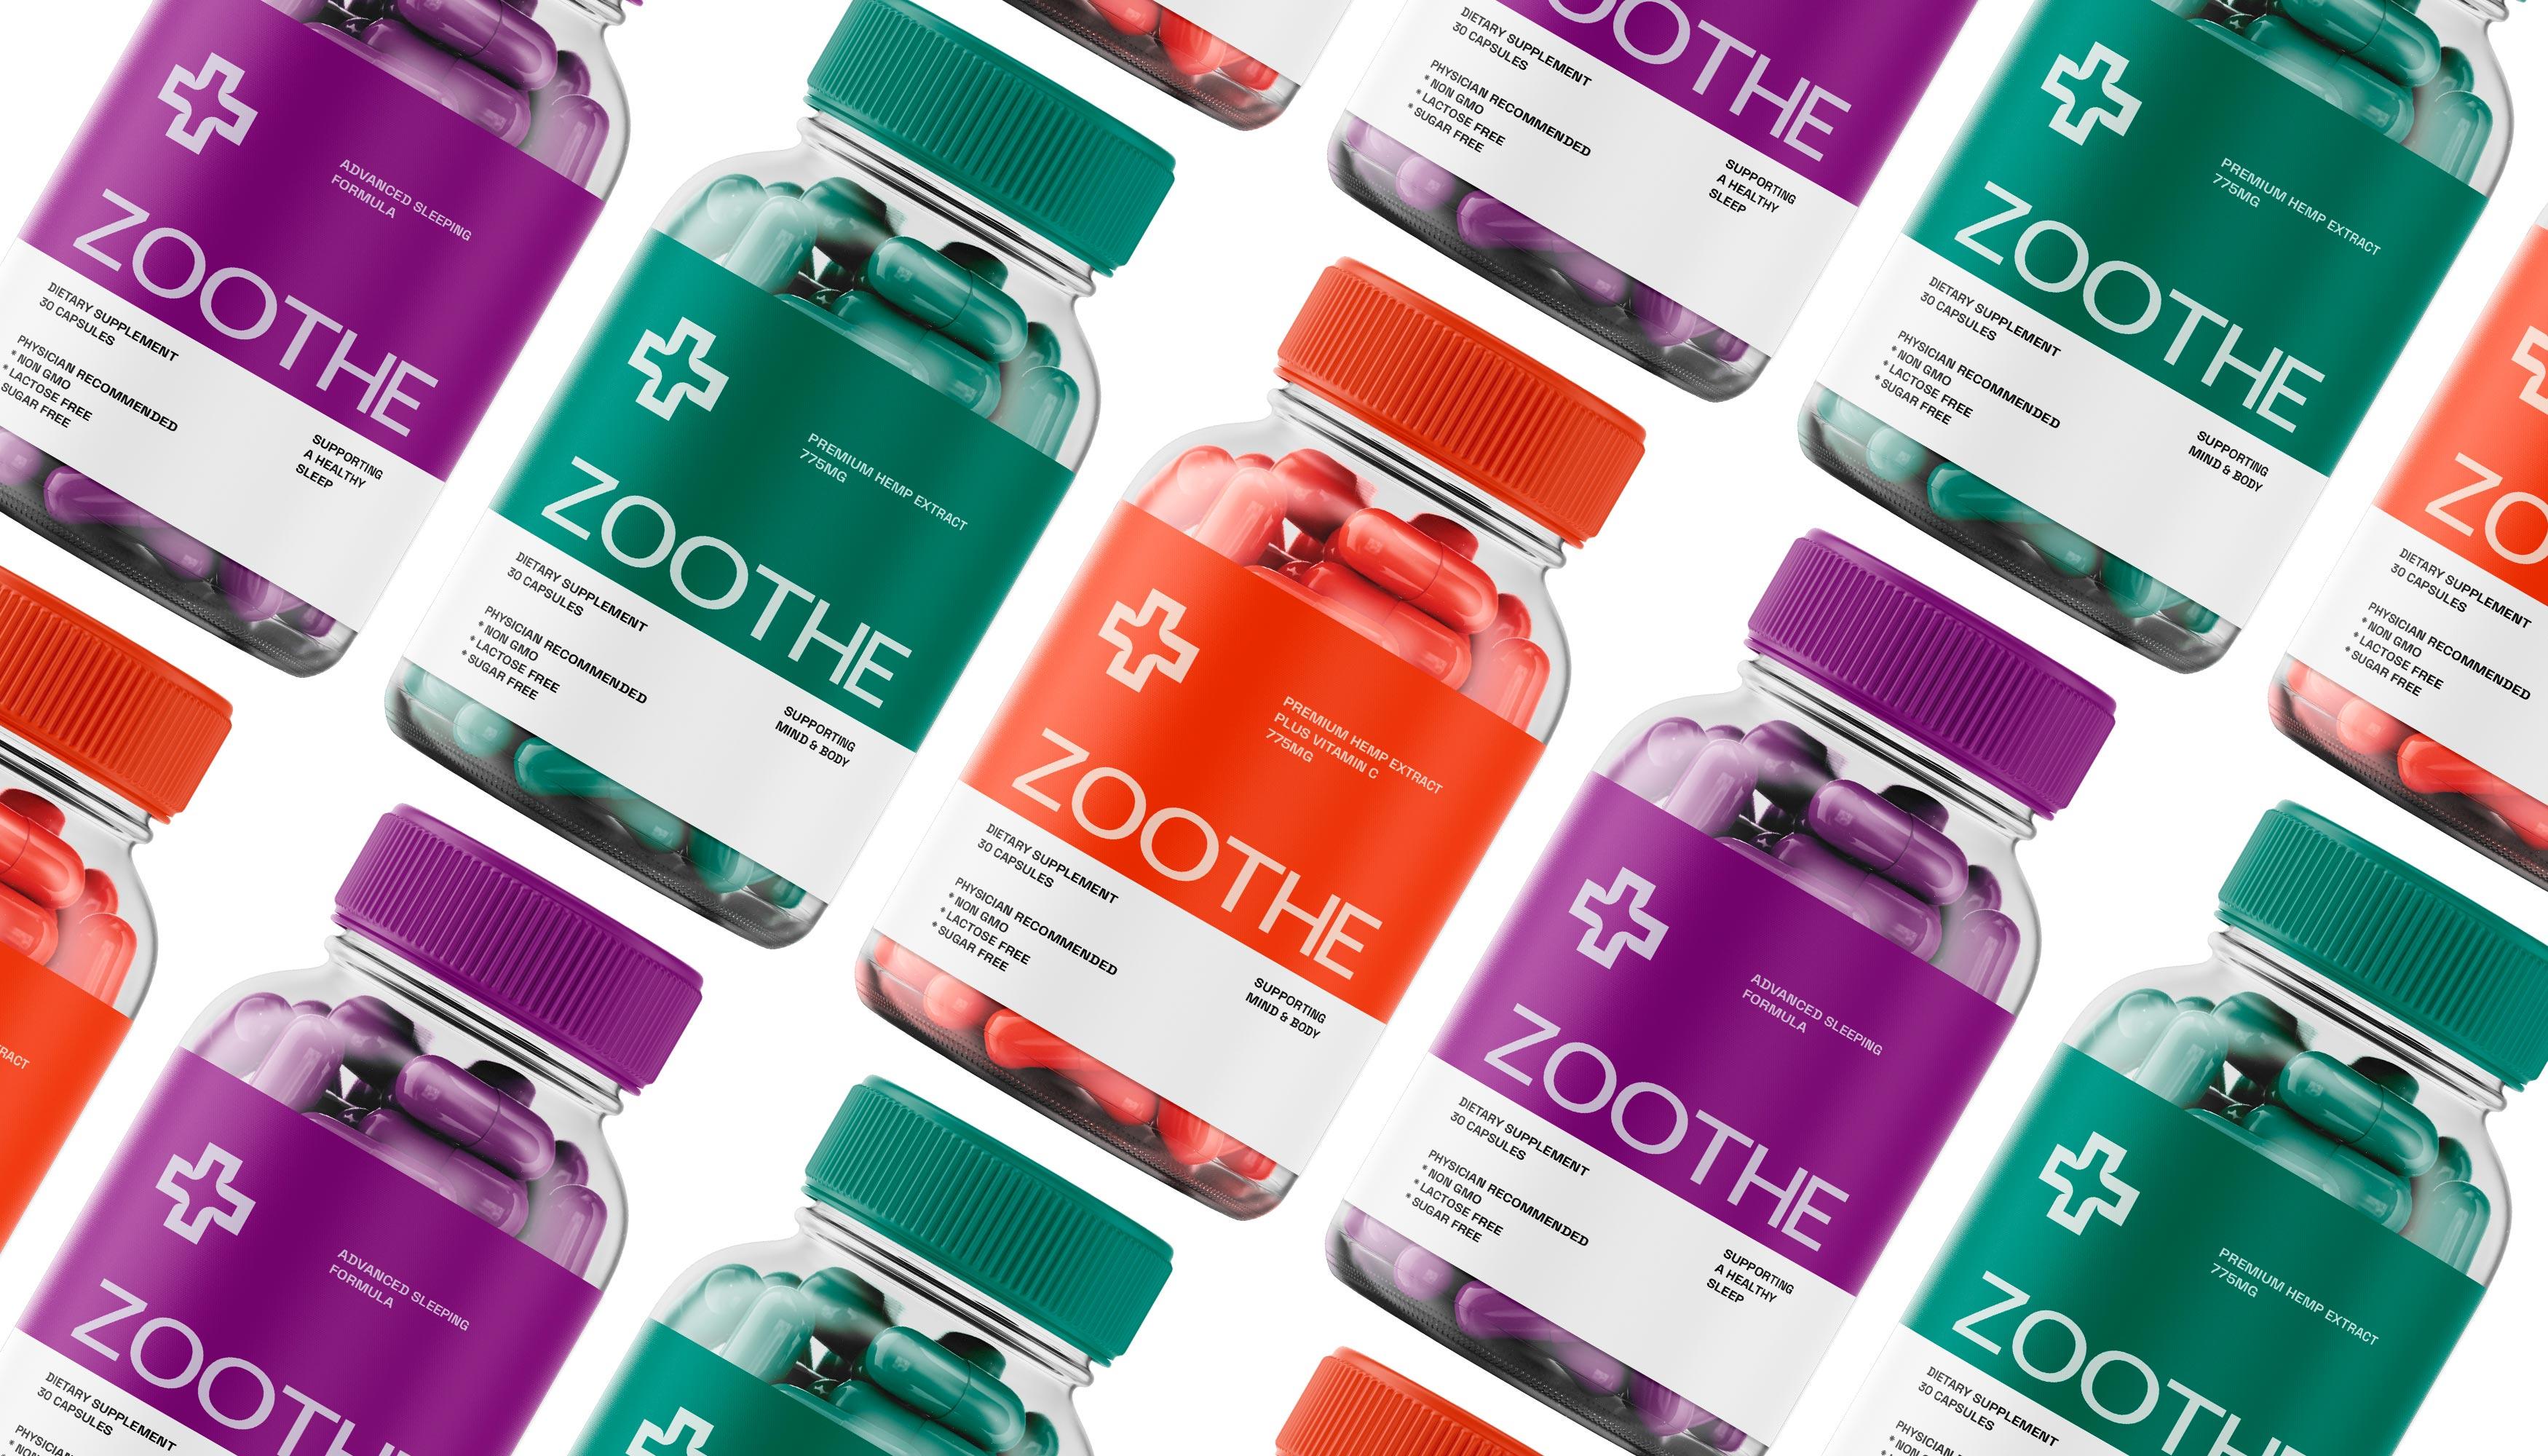 Brand Identity of Zoothe by Osvaldo Sine